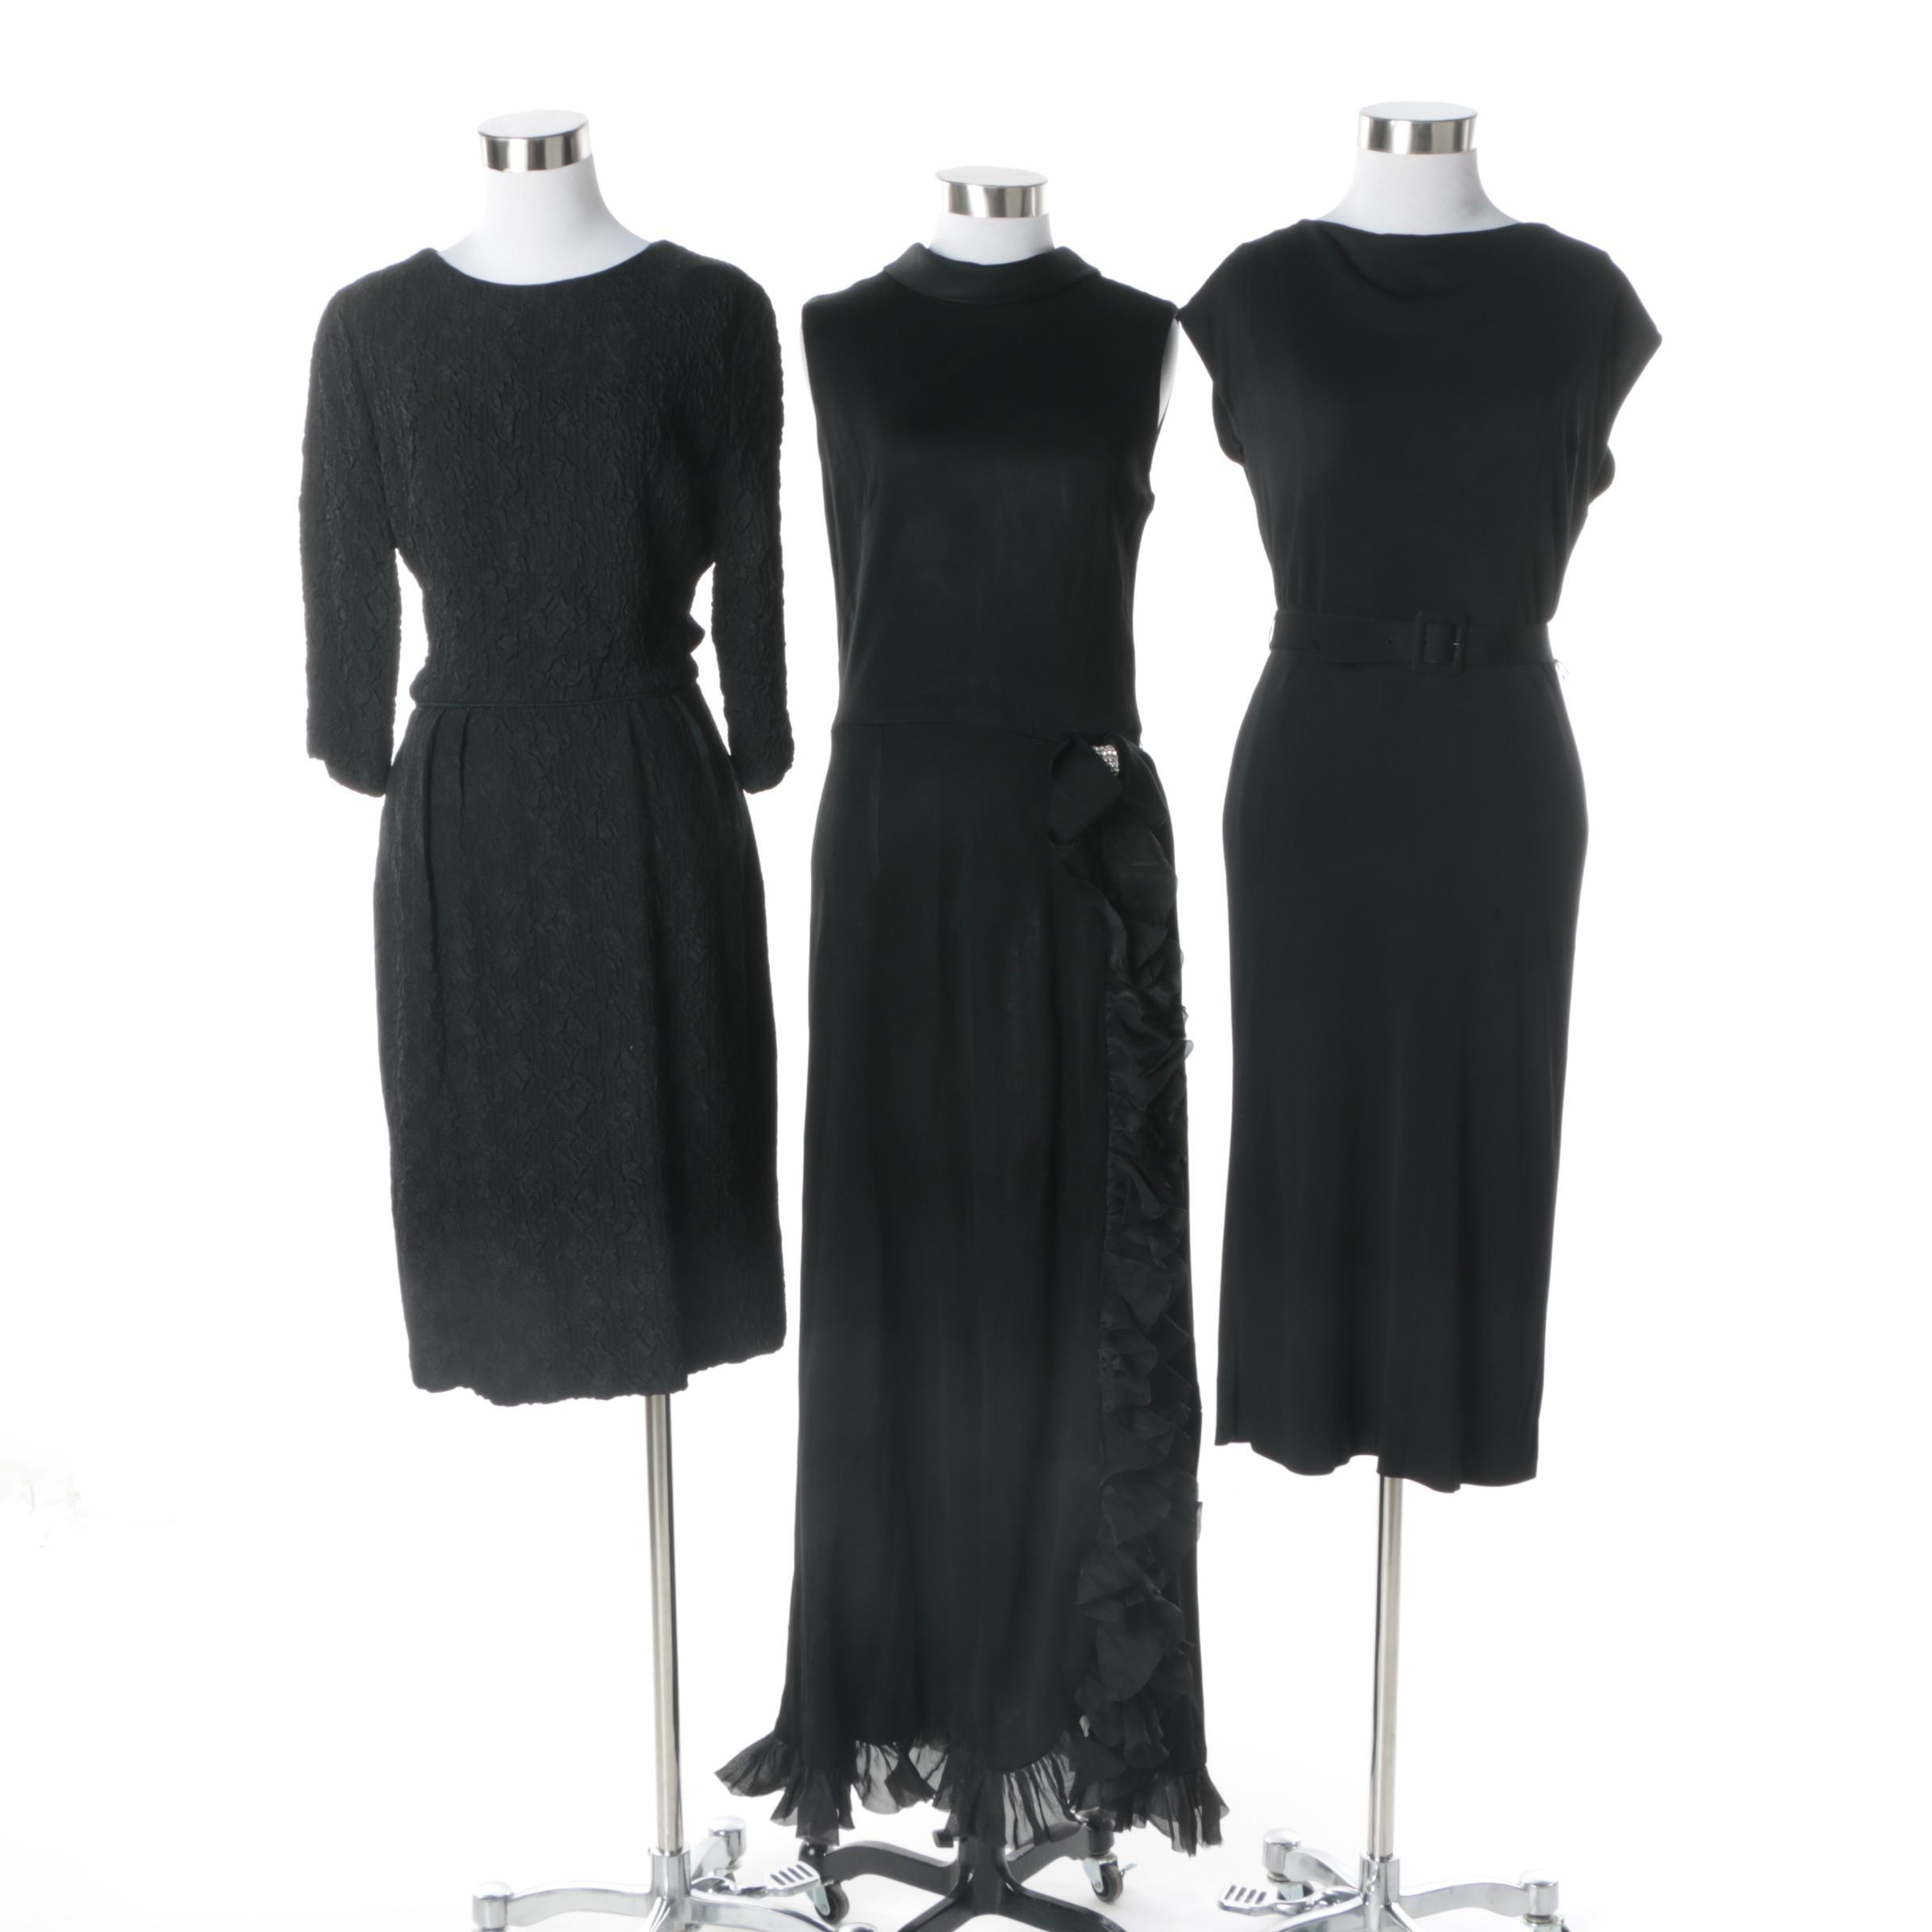 1960s and 1970s Vintage Slinky Black Cocktail Dresses